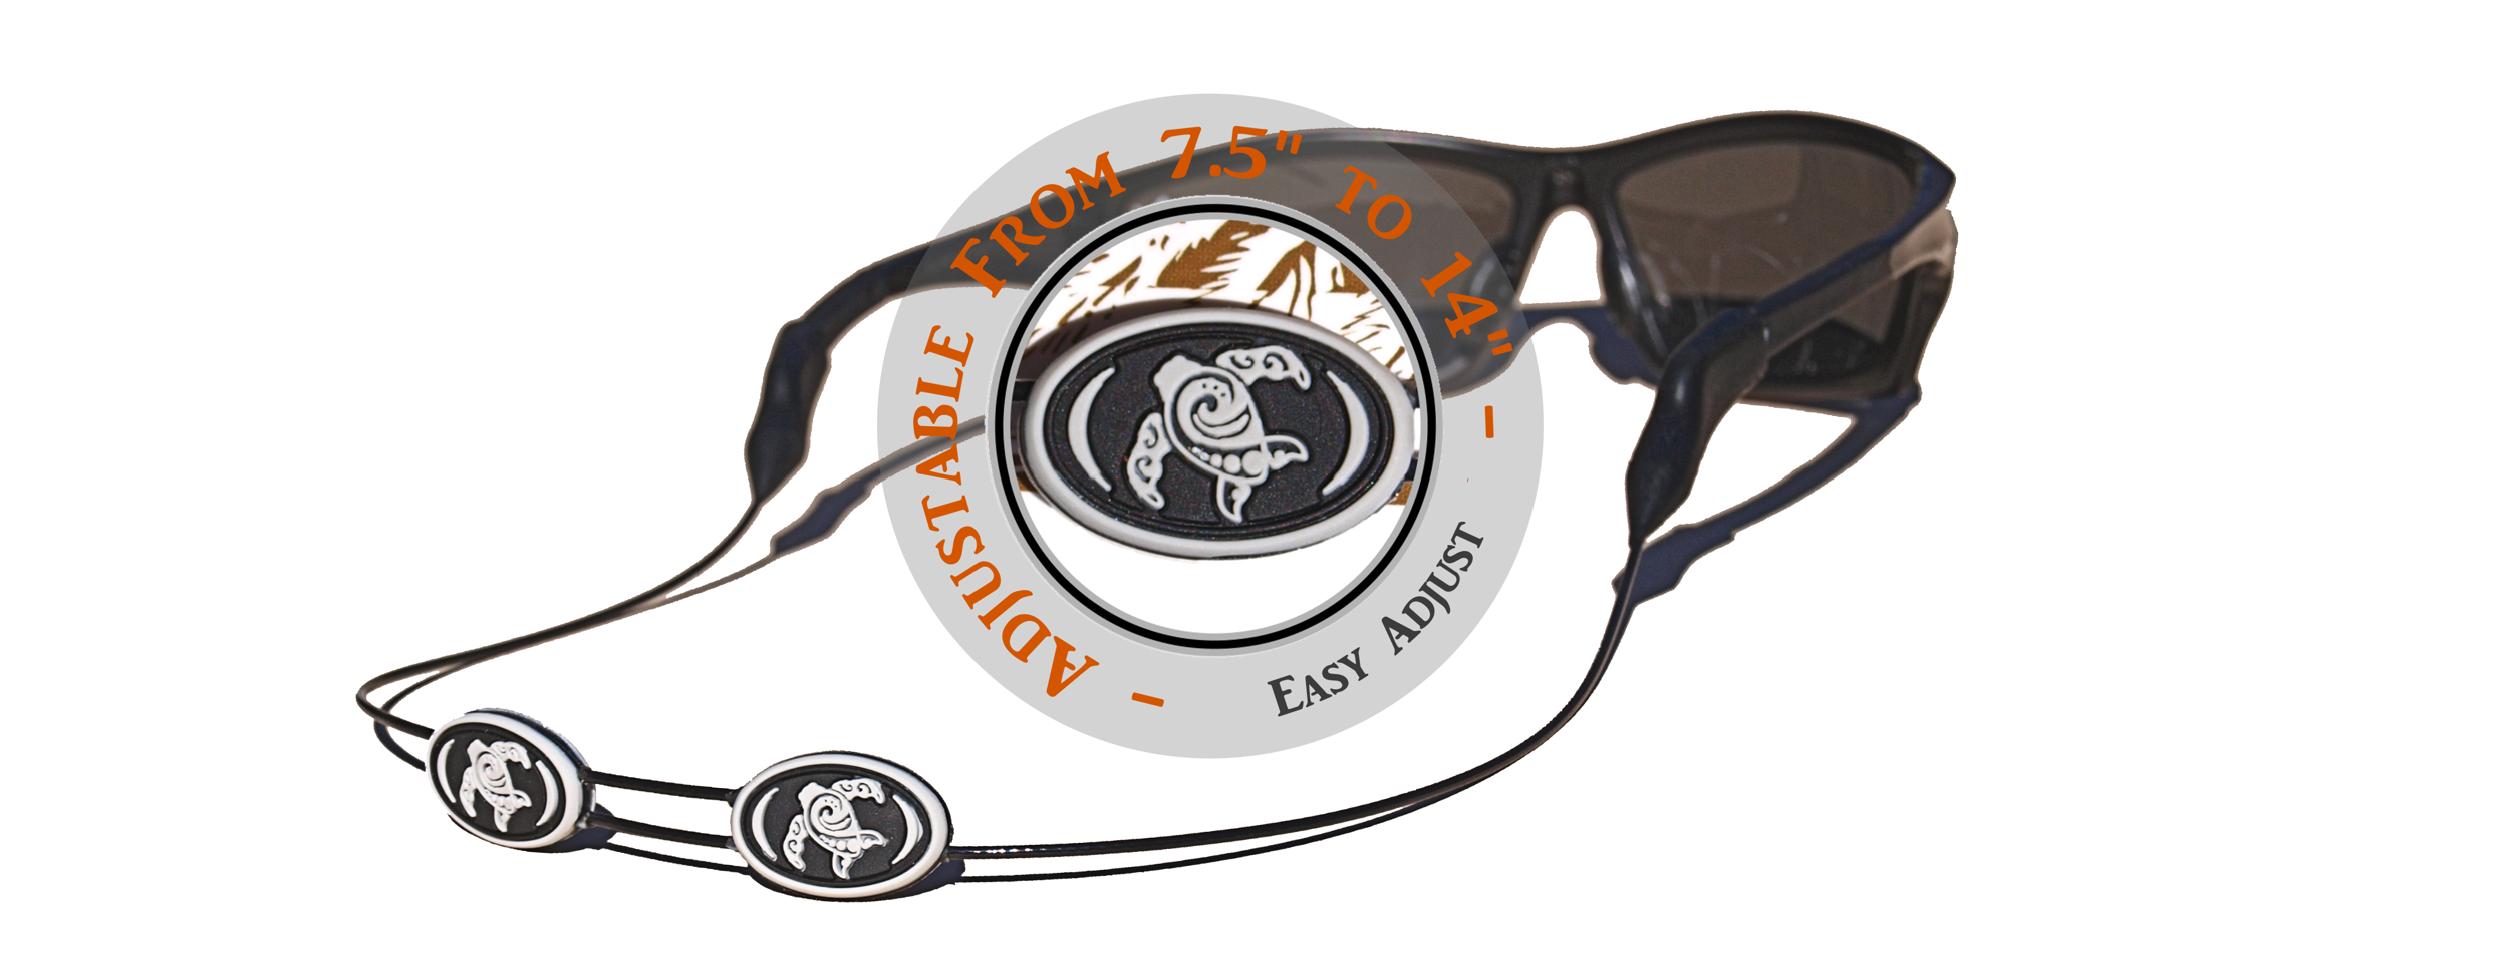 Tortuga Straps LINEZ Gray on Black Adjustable Glasses Strap